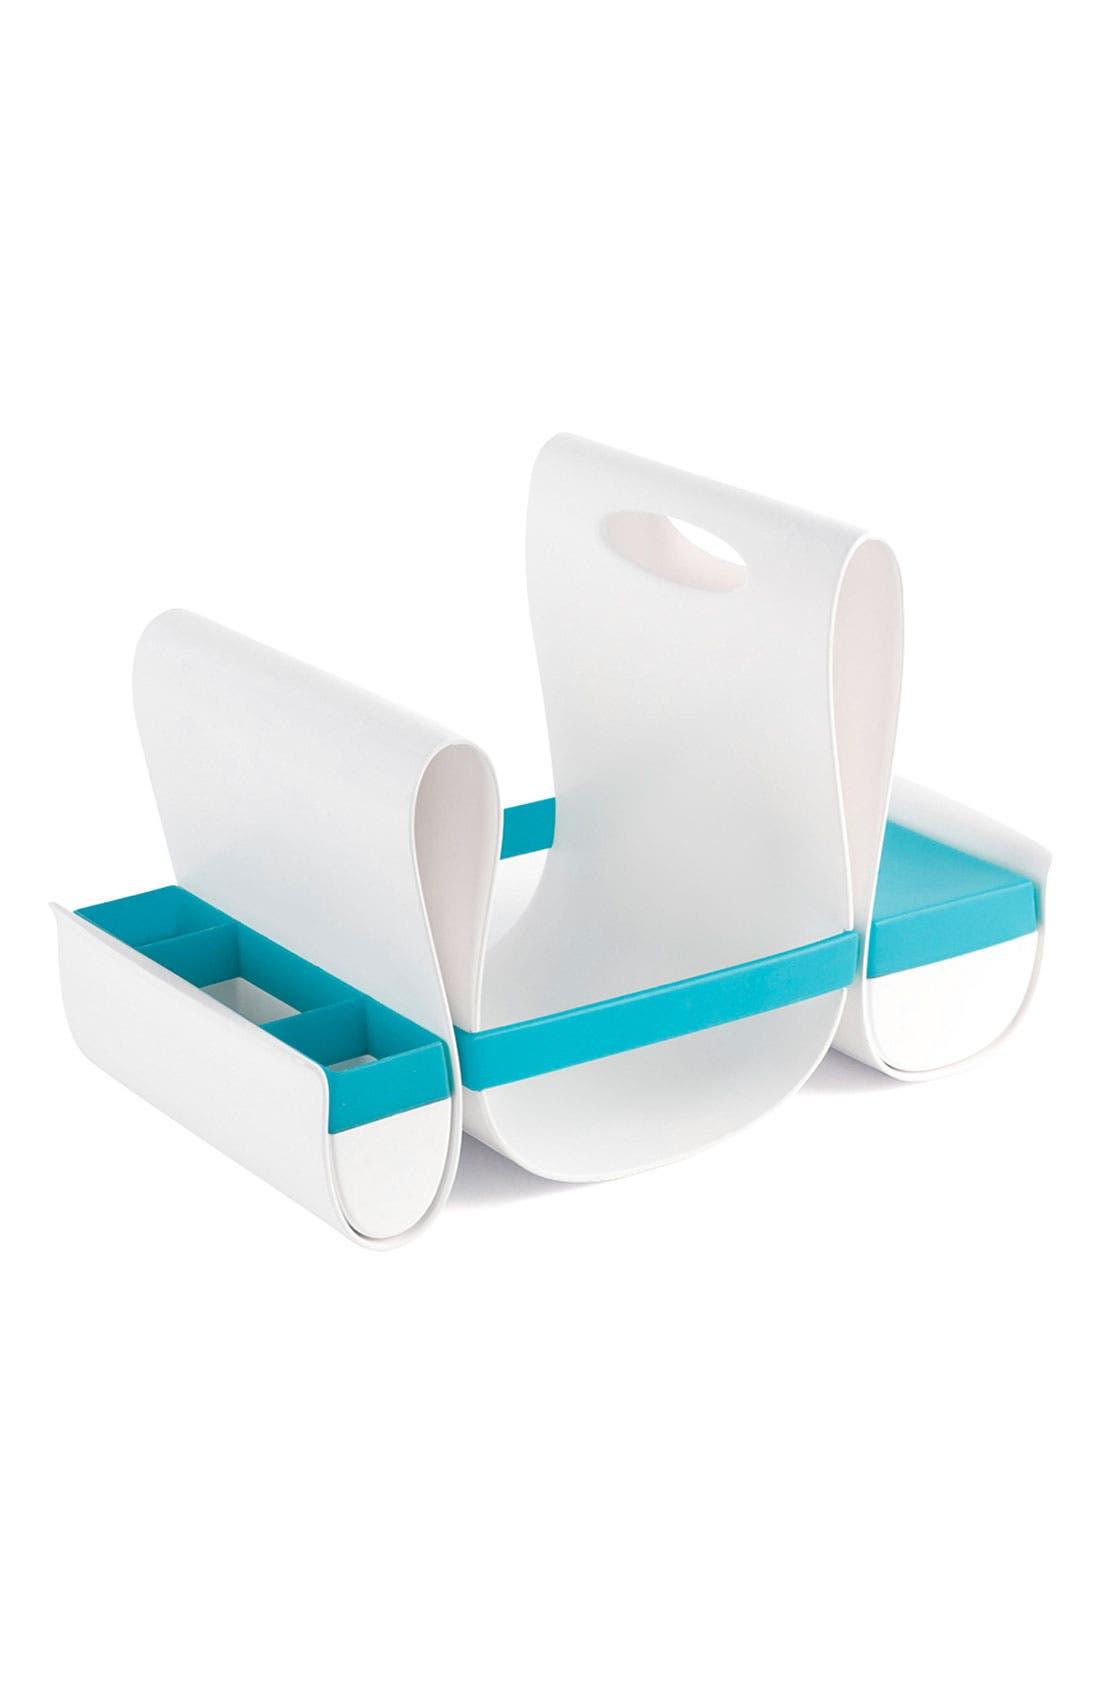 Main Image - Boon 'Loop' Diaper Caddy